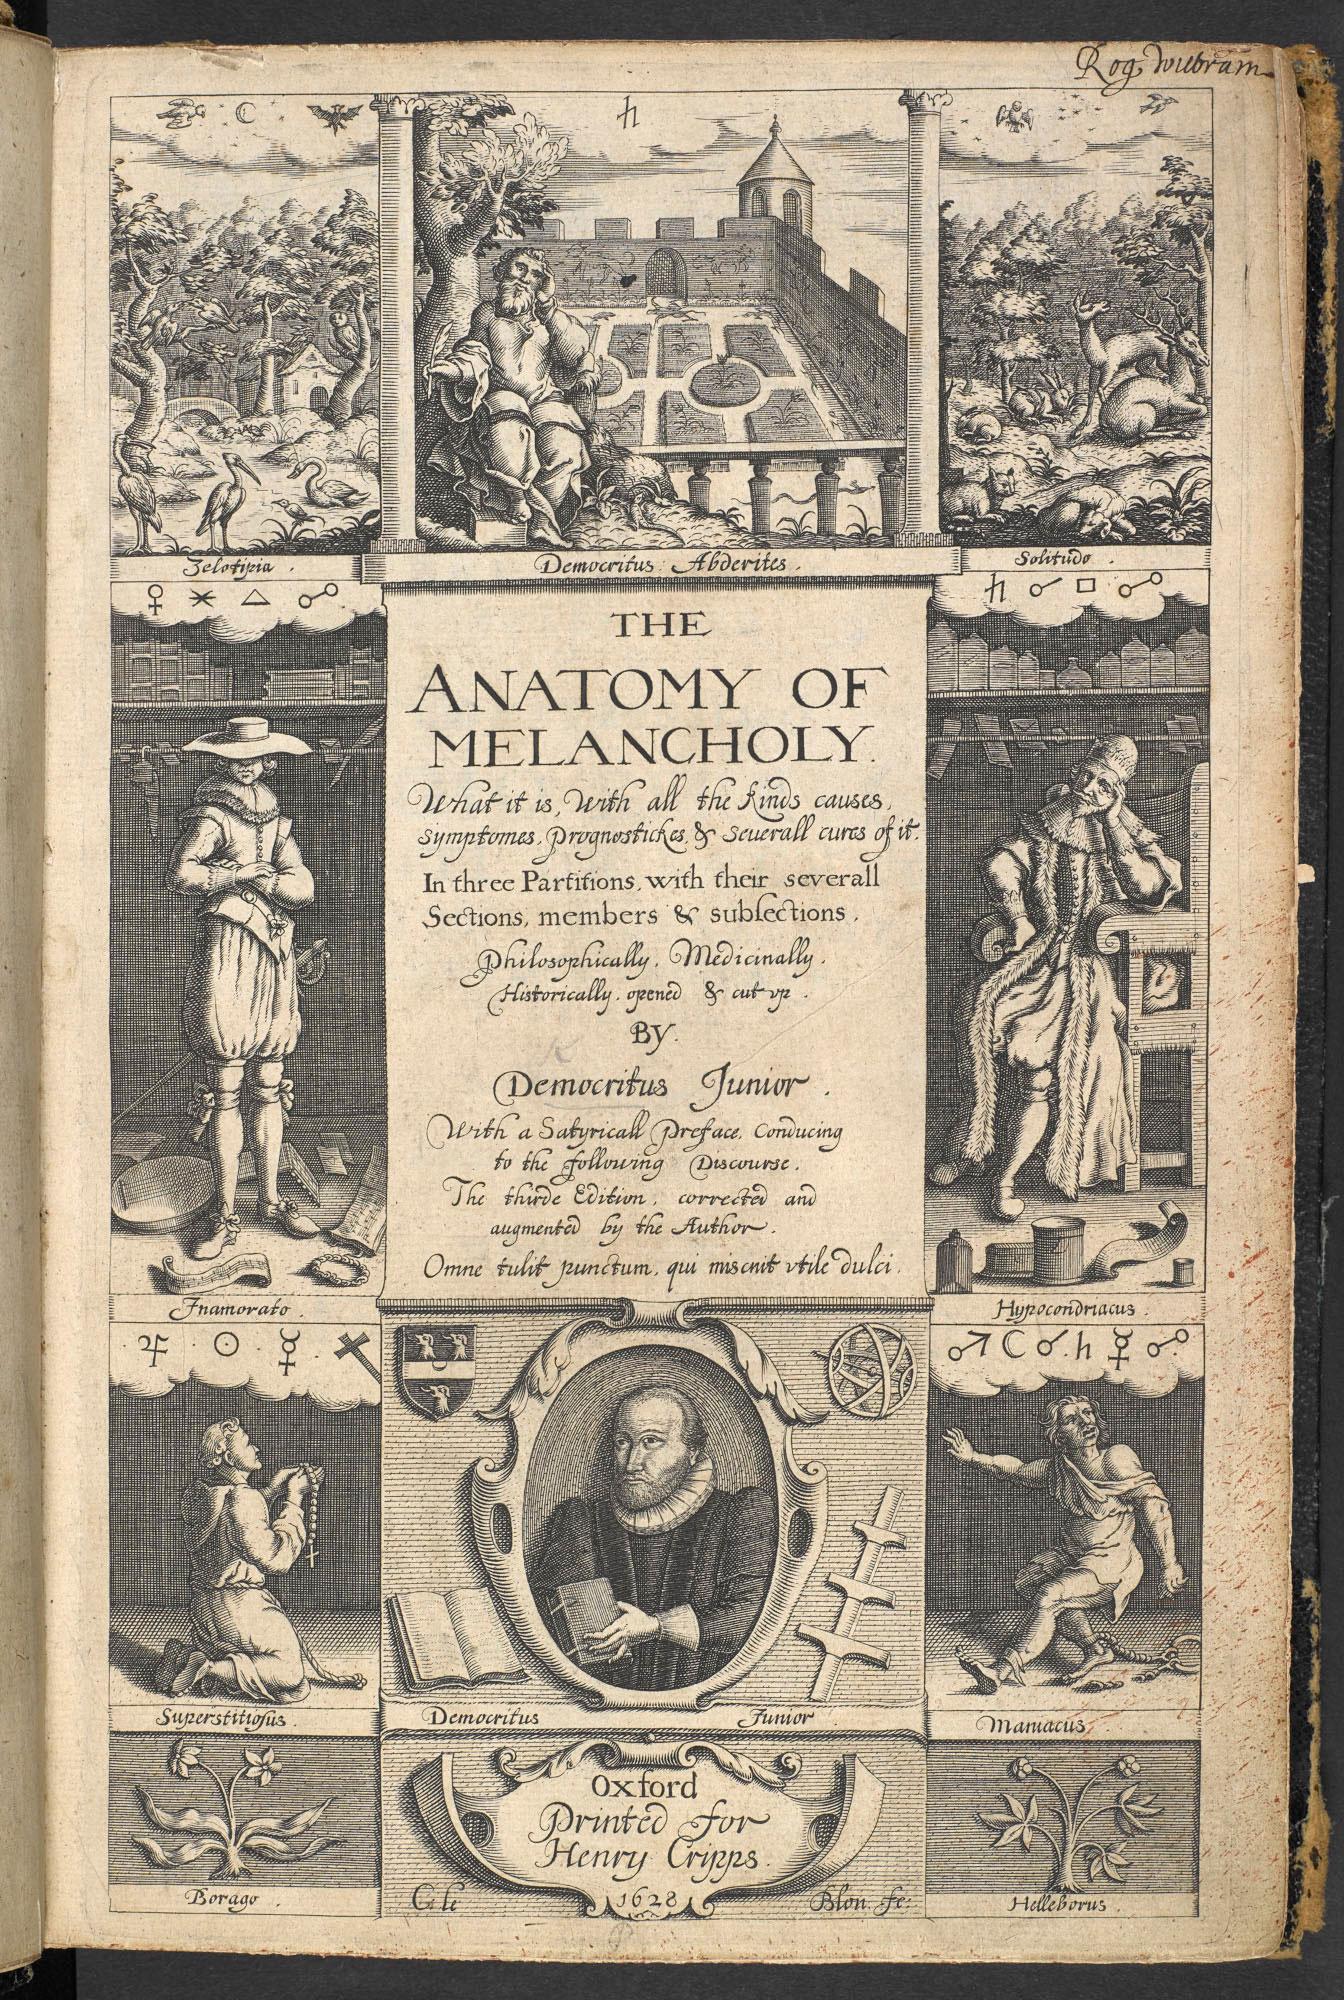 Robert_Burton's_Anatomy_of_Melancholy,_1626,_2nd_edition.jpg